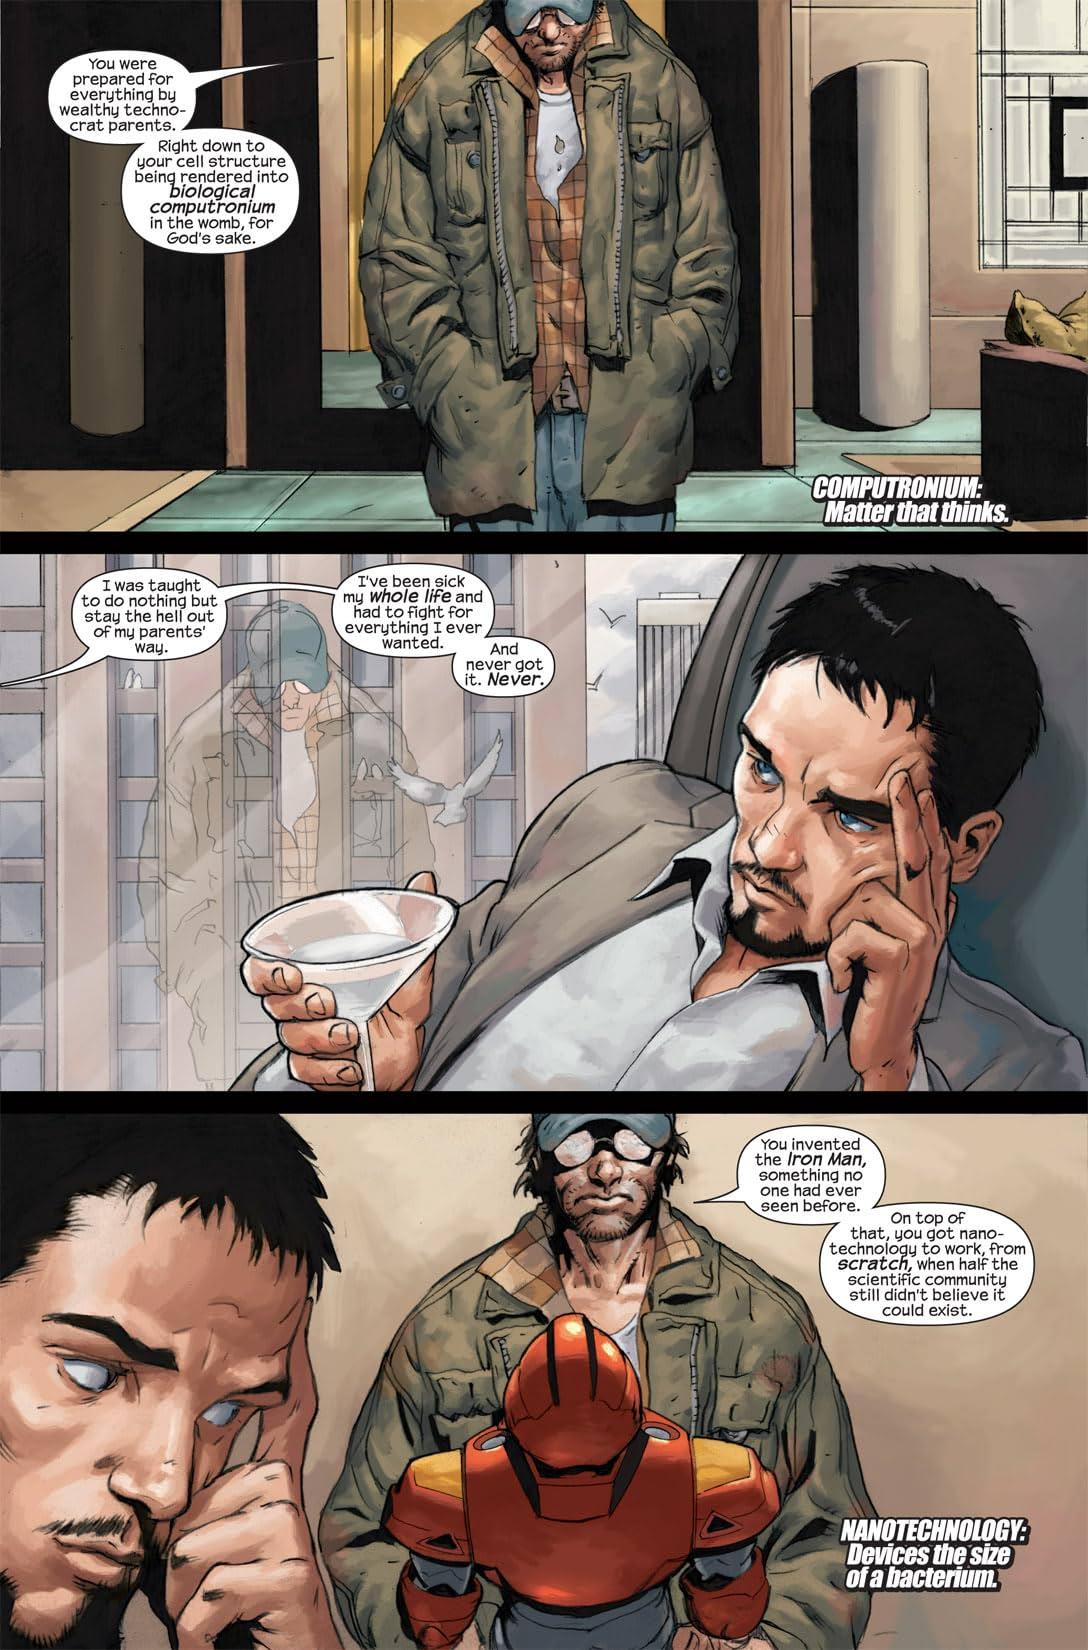 Ultimate Hulk vs. Iron Man: Ultimate Human